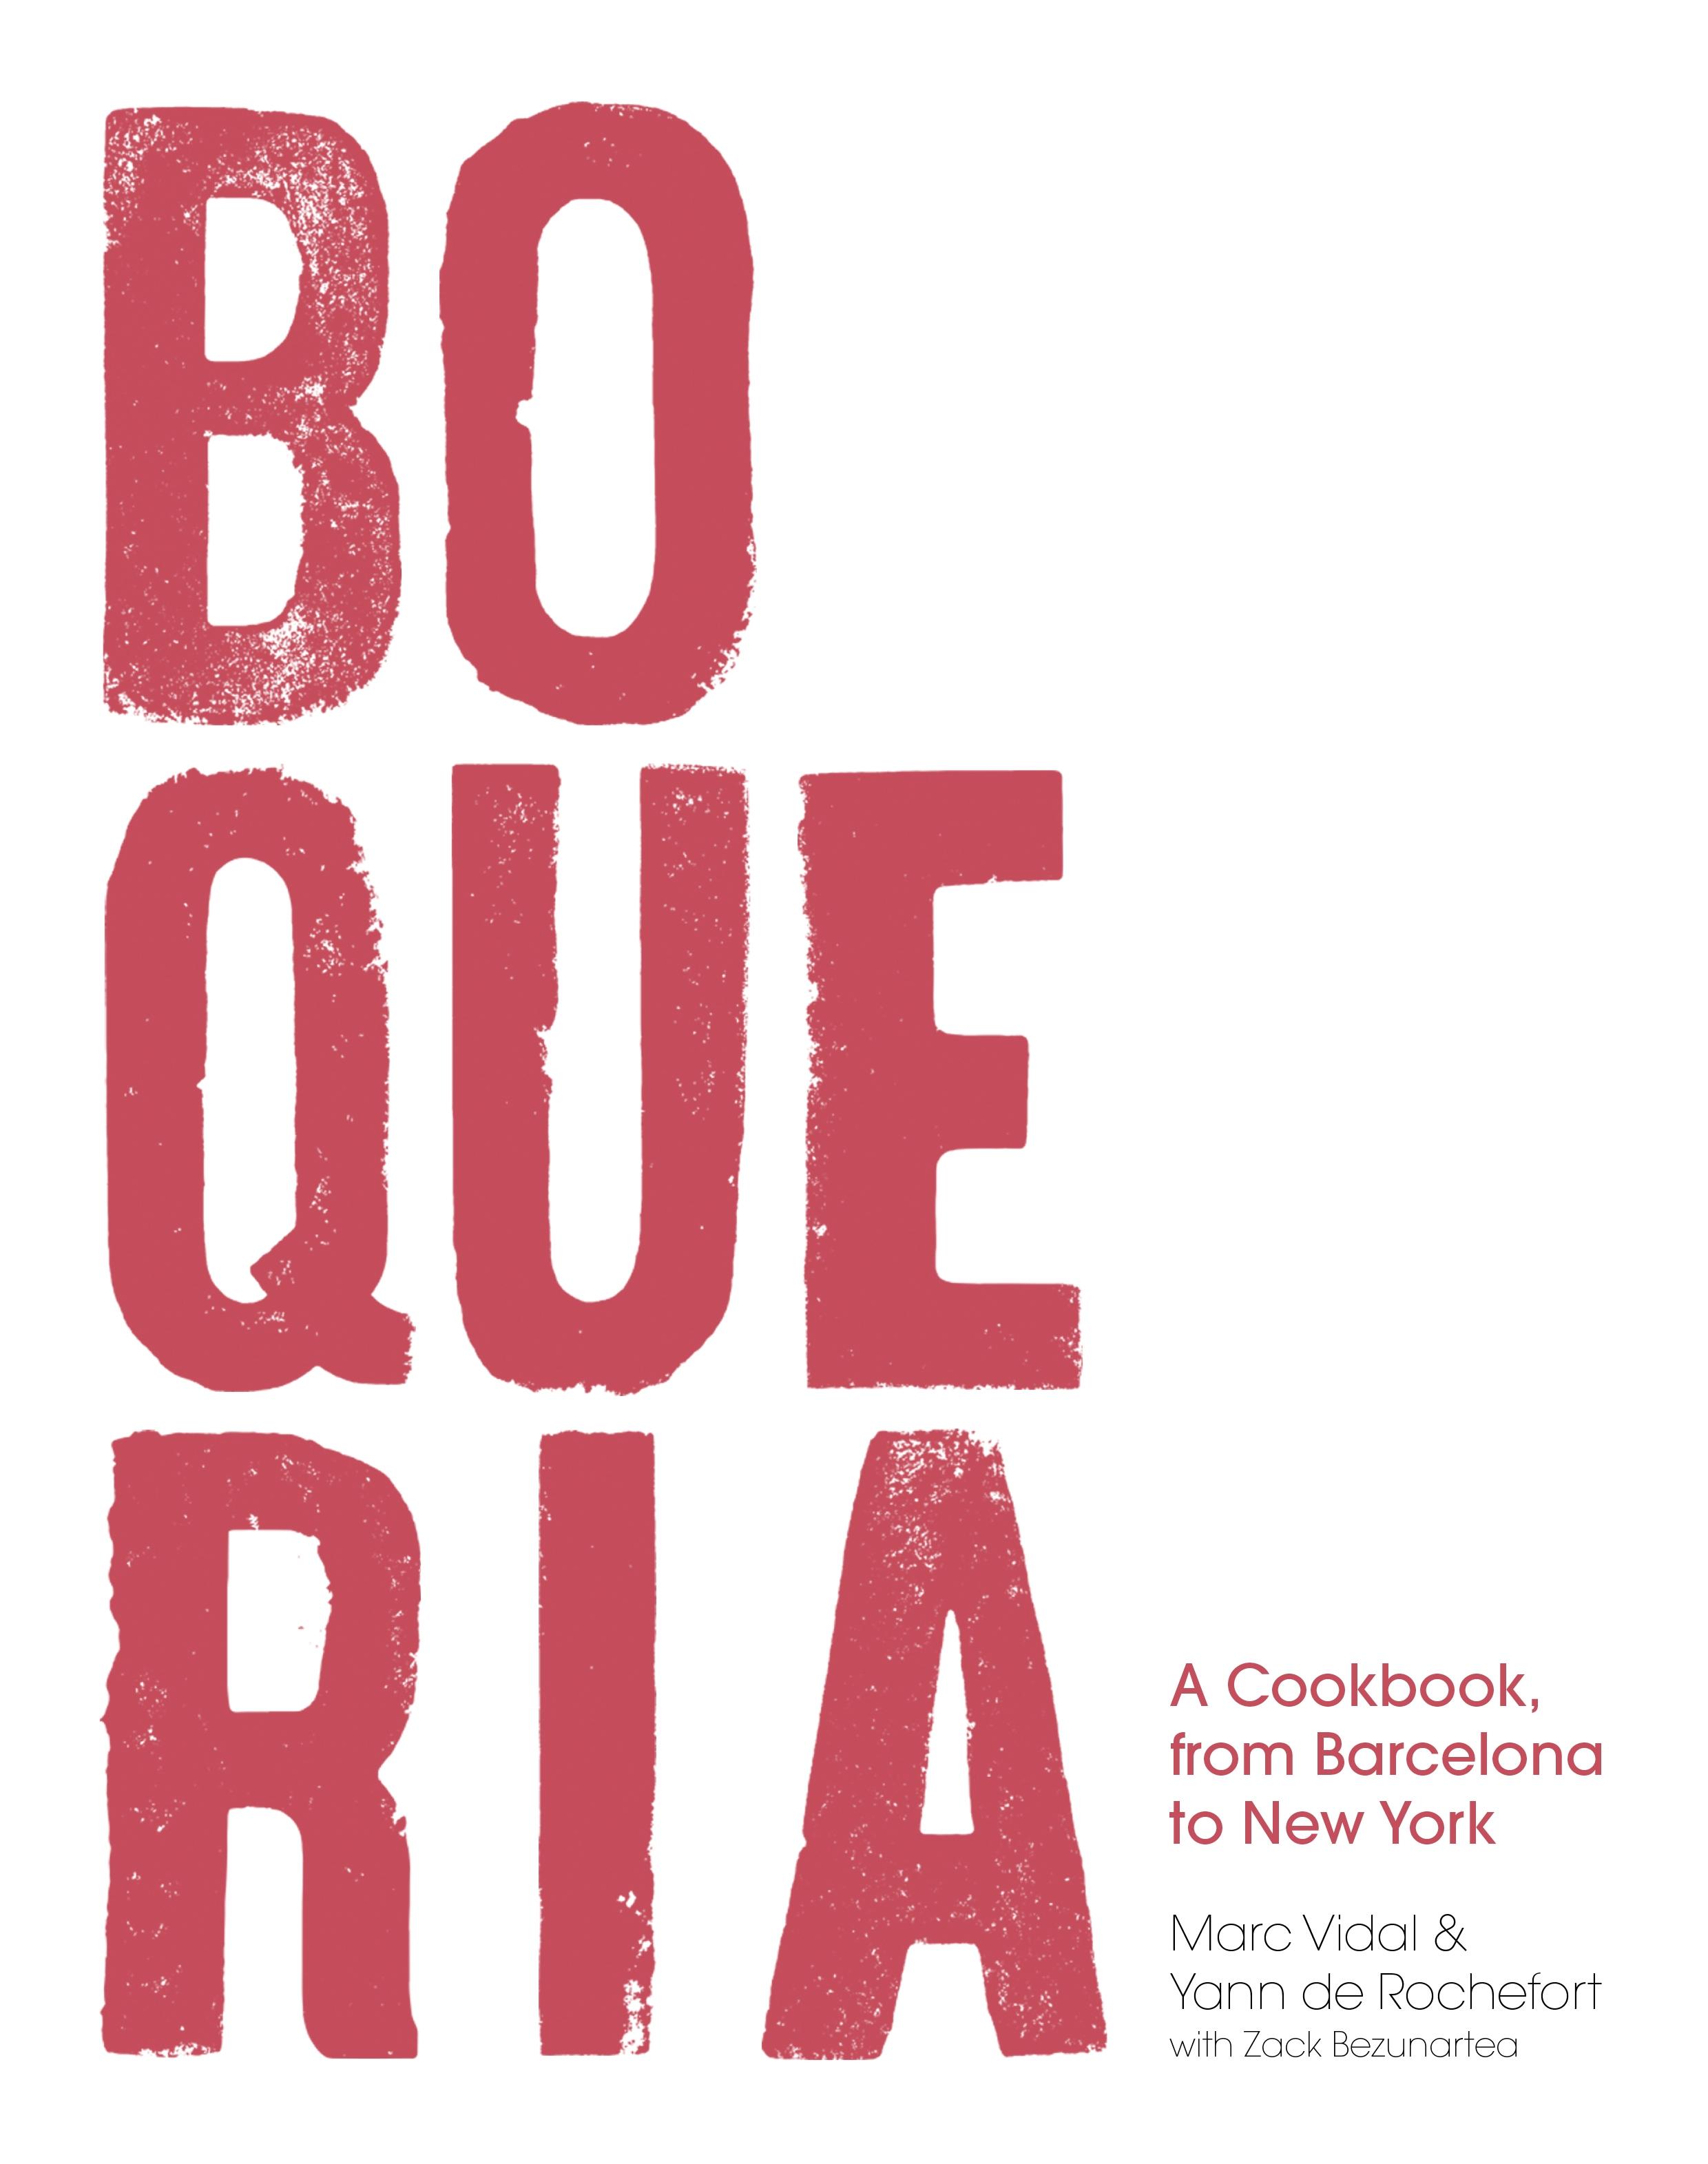 Book Launch: Boqueria: A Cookbook, from Barcelona to New York by Marc Vidal & Yann de Rochefort